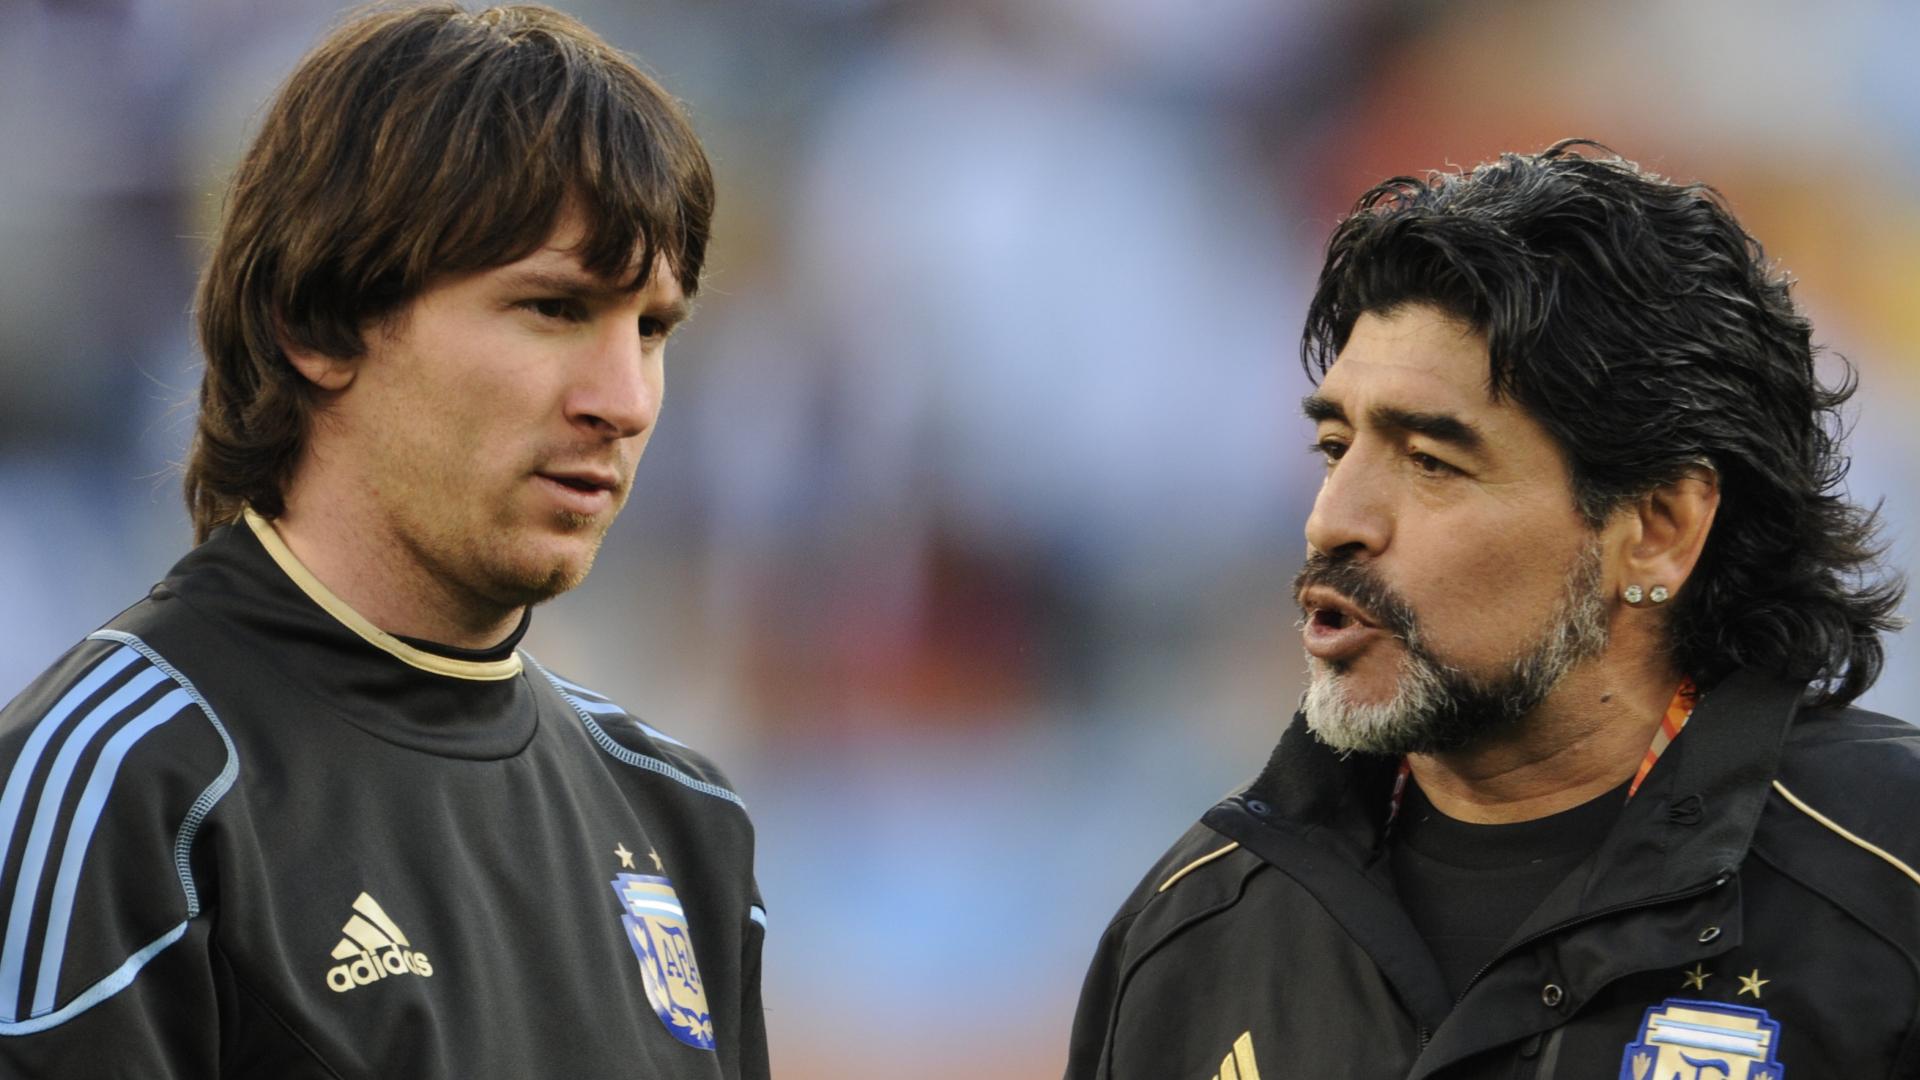 'Messi & Ronaldo couldn't dream of Maradona's admiration' – Ardiles pays tribute to 'genius in football'